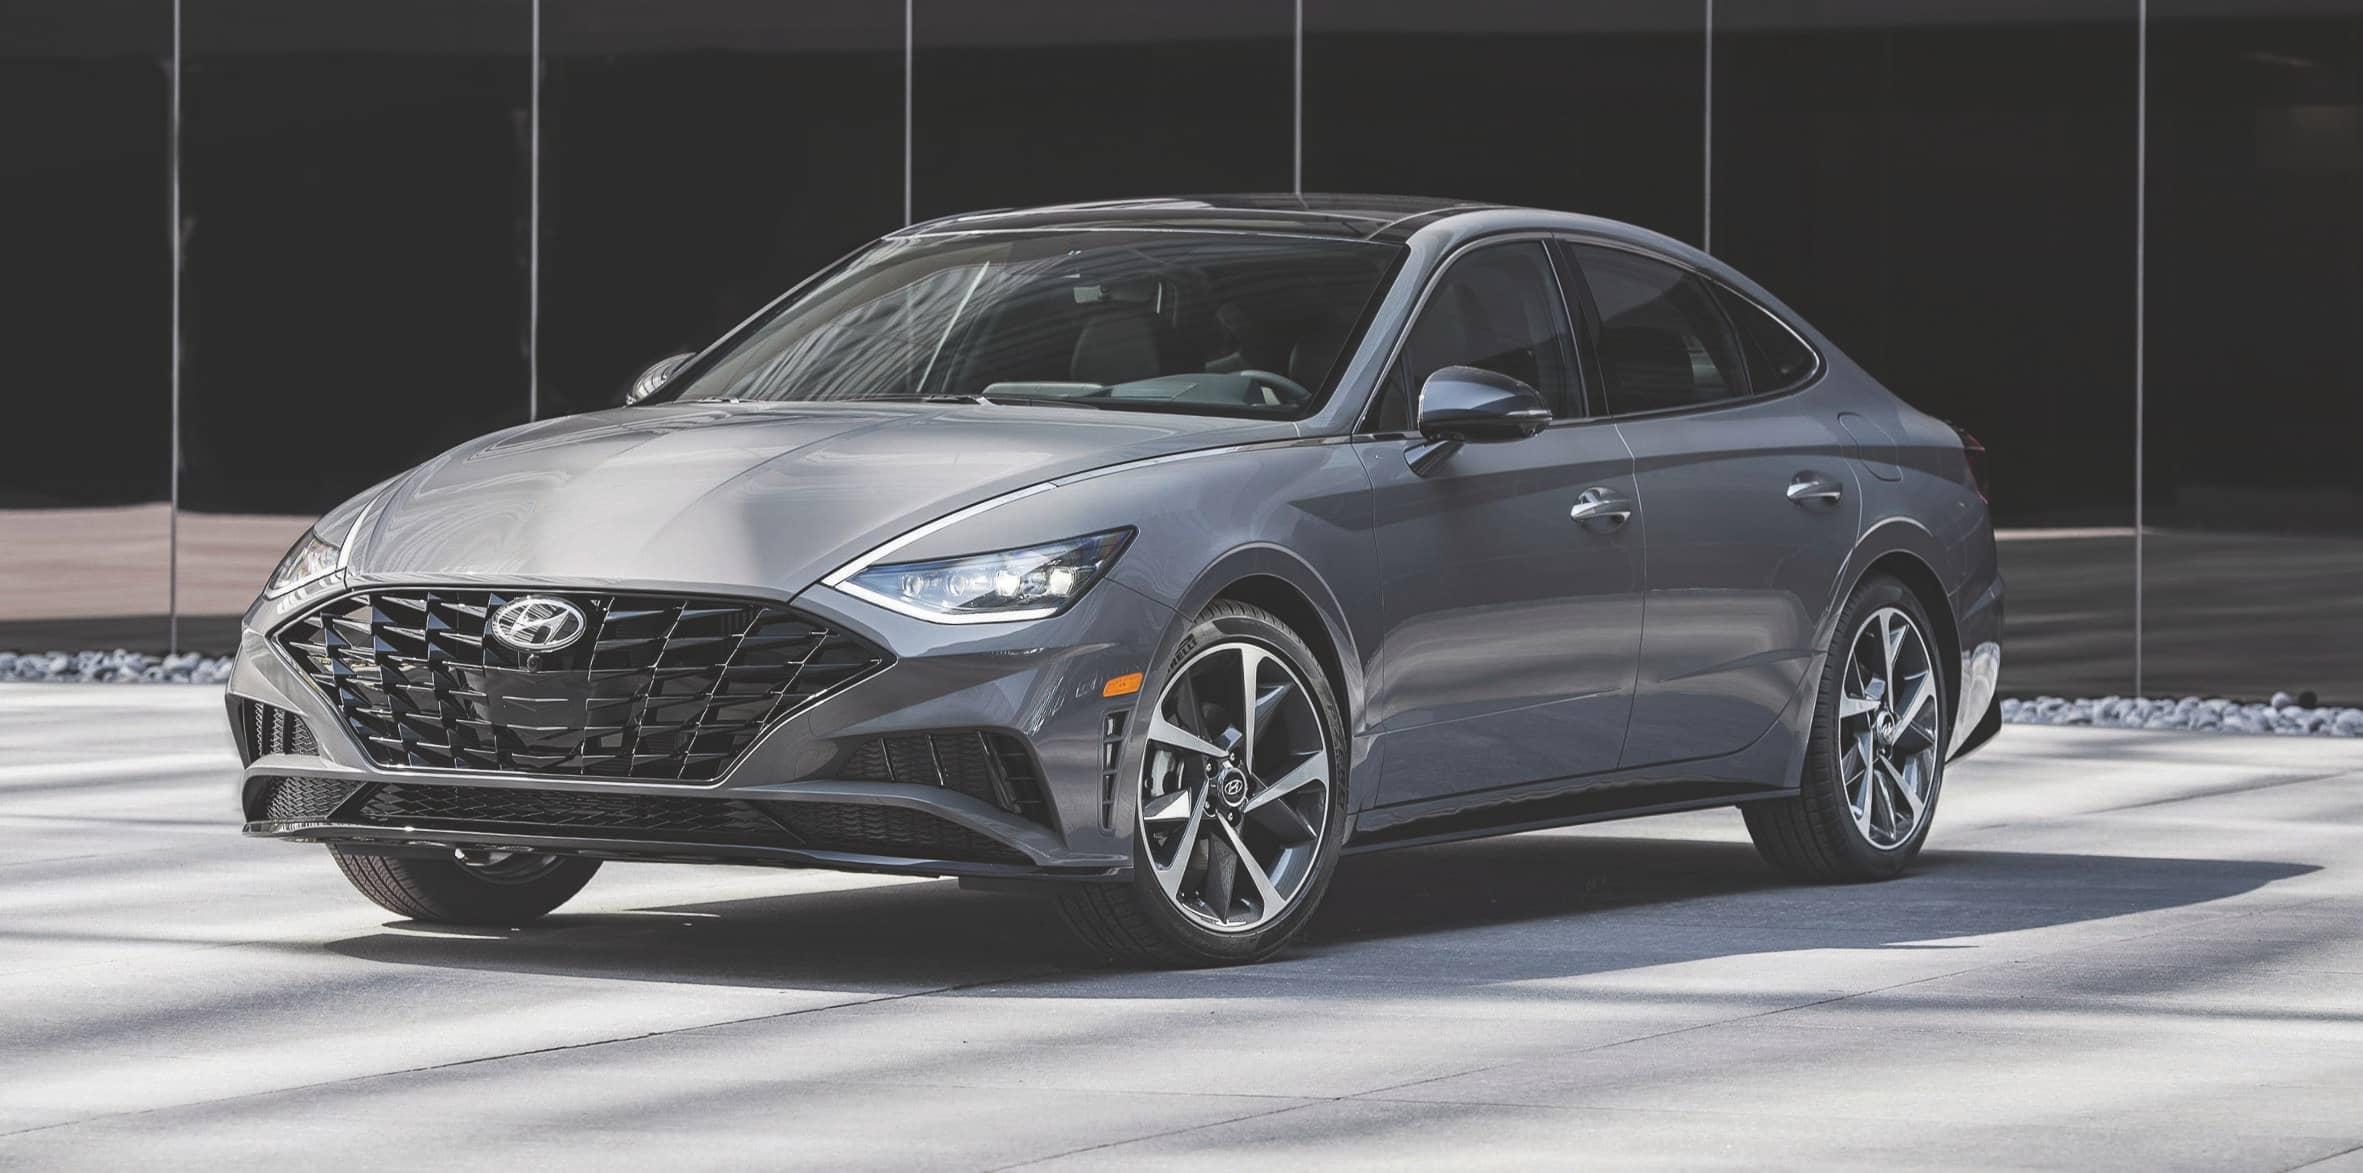 Hyundai's Bold Design Aims To Rescue The Midsize Car